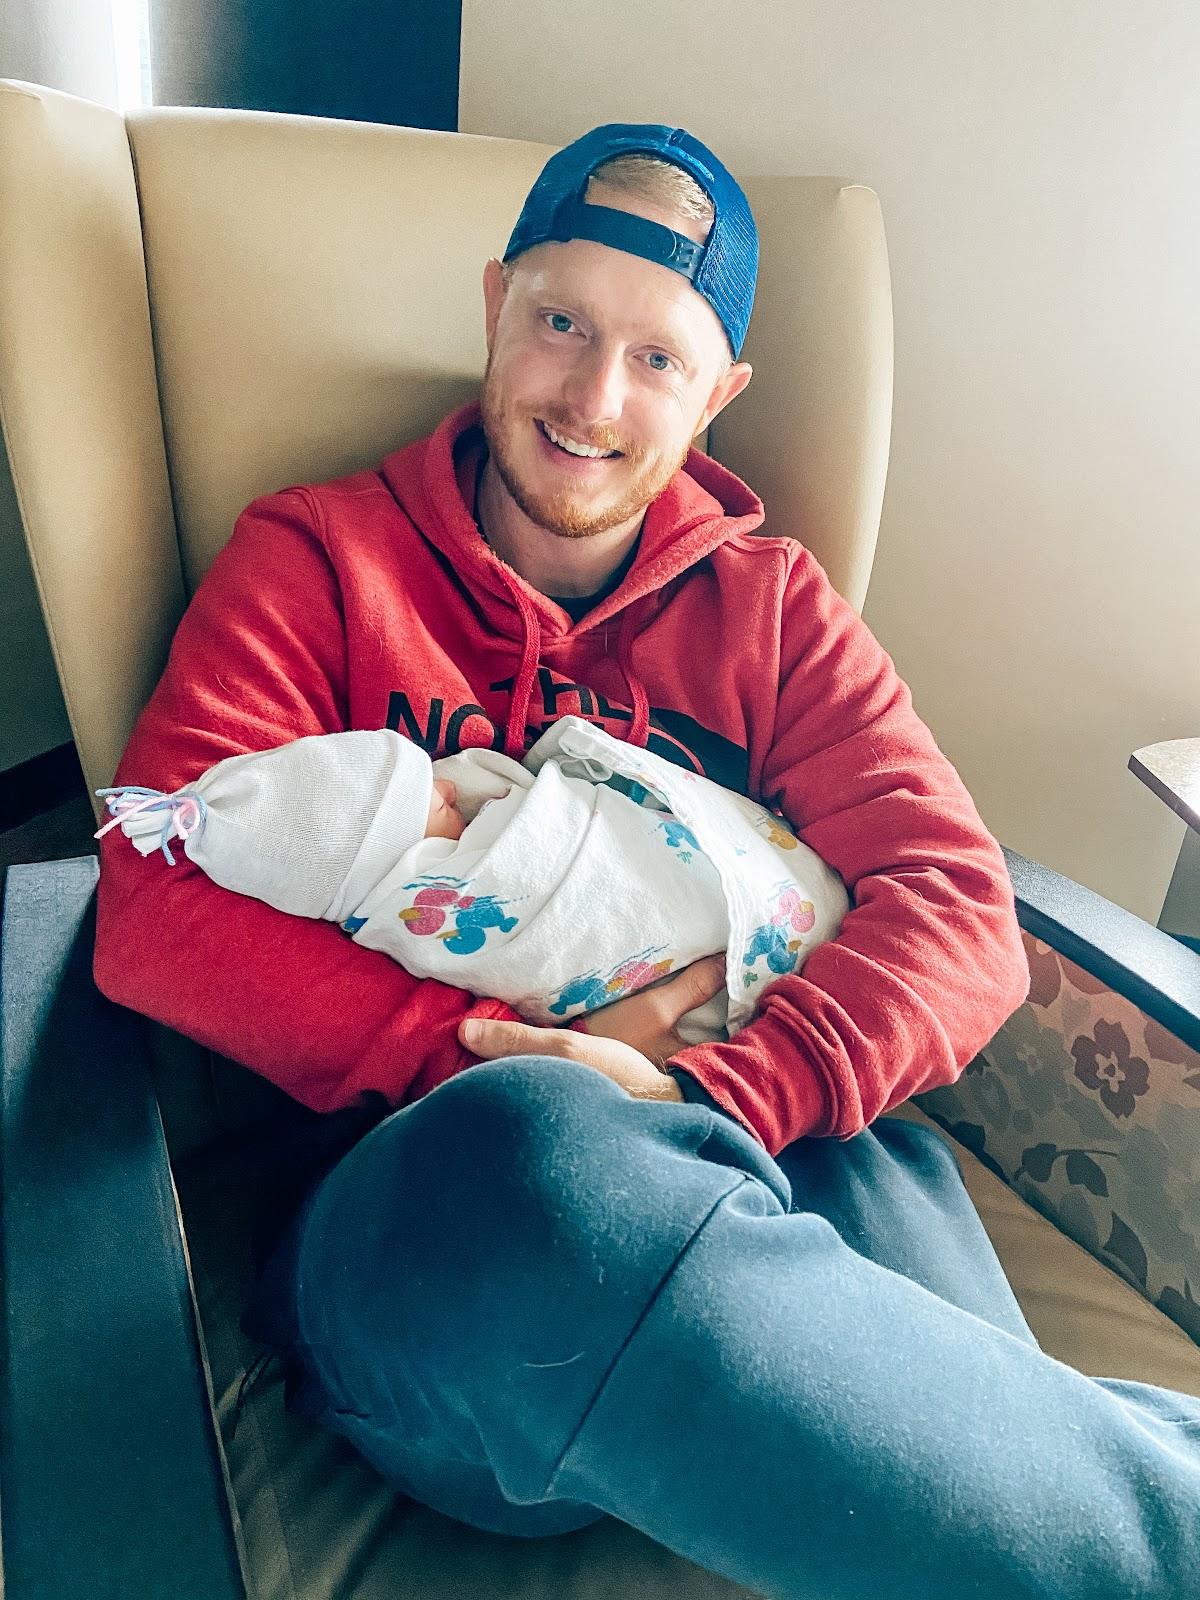 my birth story; newborn baby boy, AdventHealth Shawnee Mission Birth Center